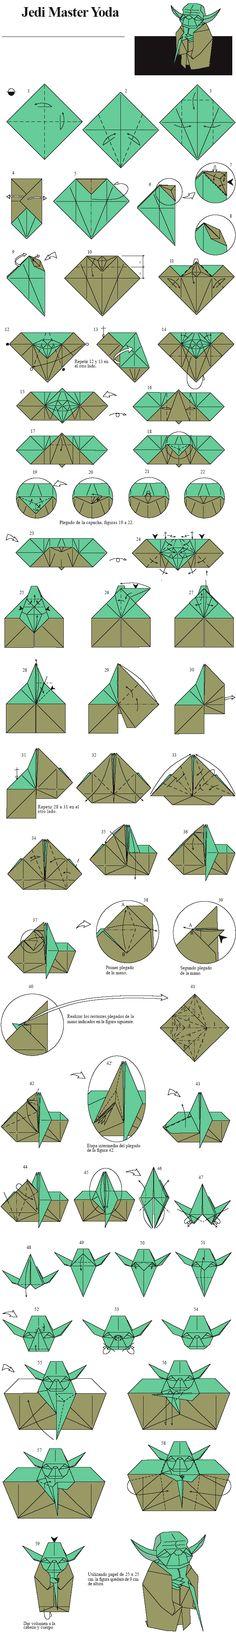 Origami Jedi Master Yoda // Designed by Fumiaki Kawahata